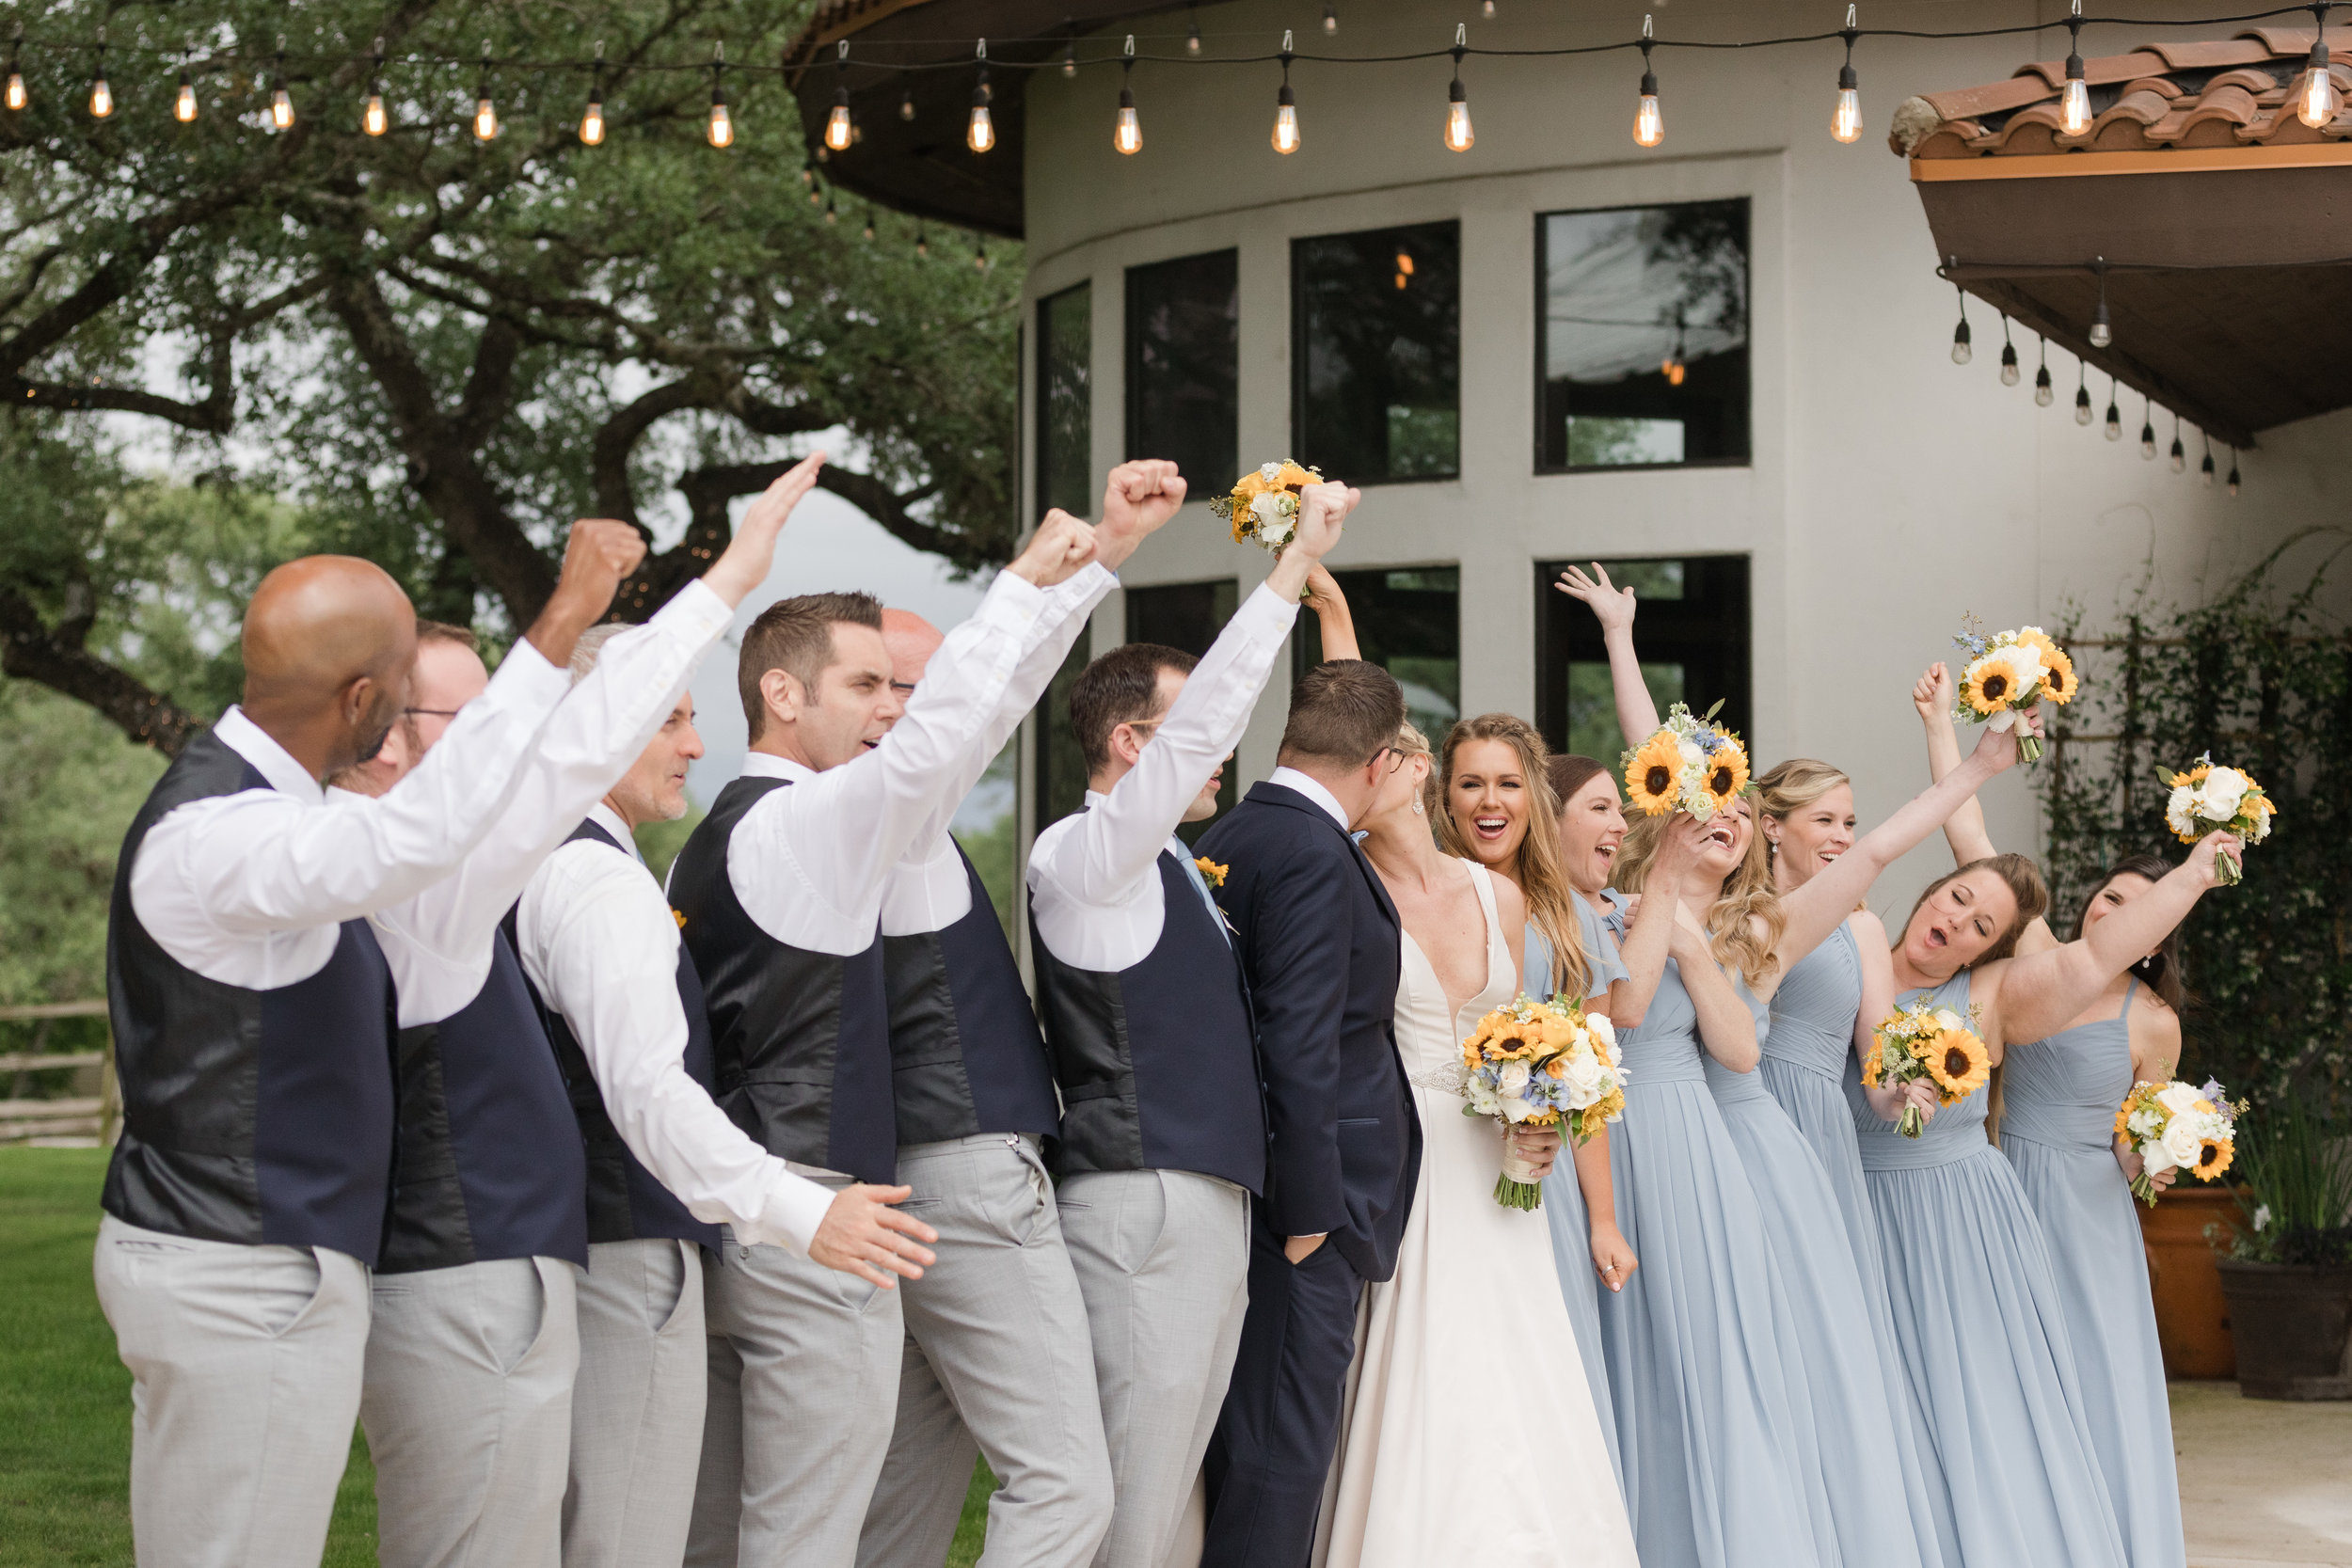 Laufs-Wedding-267.jpg